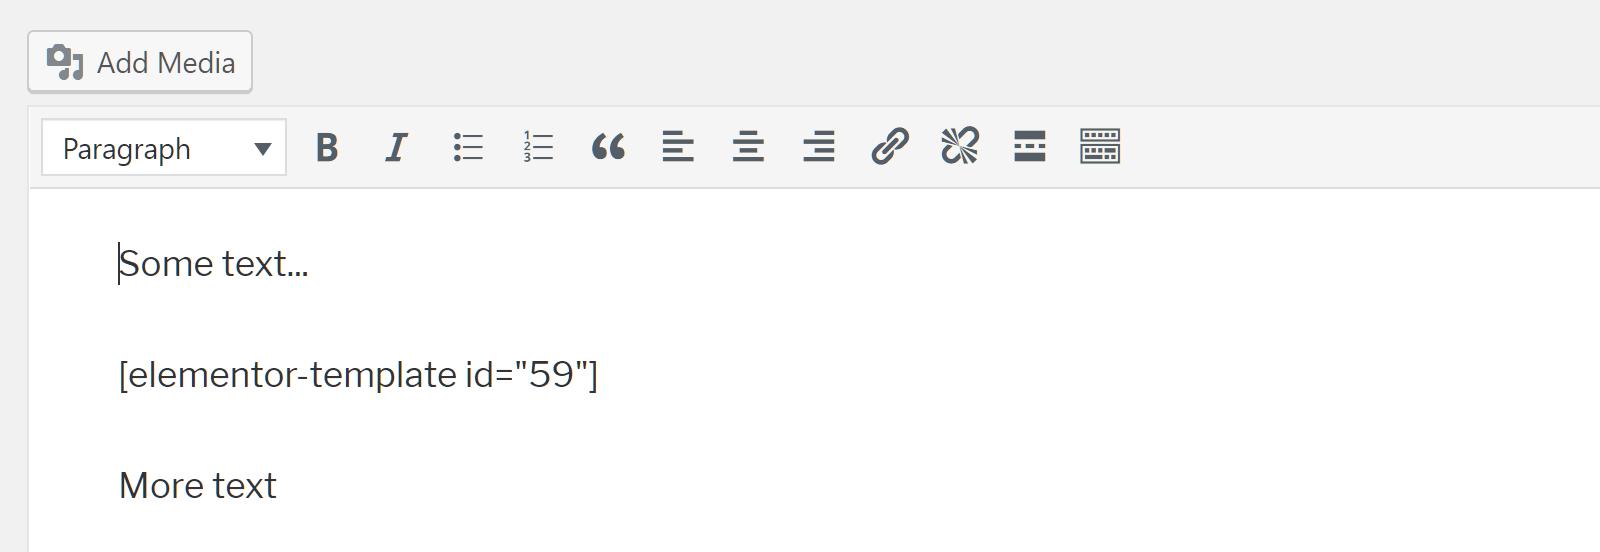 Código corto en texto